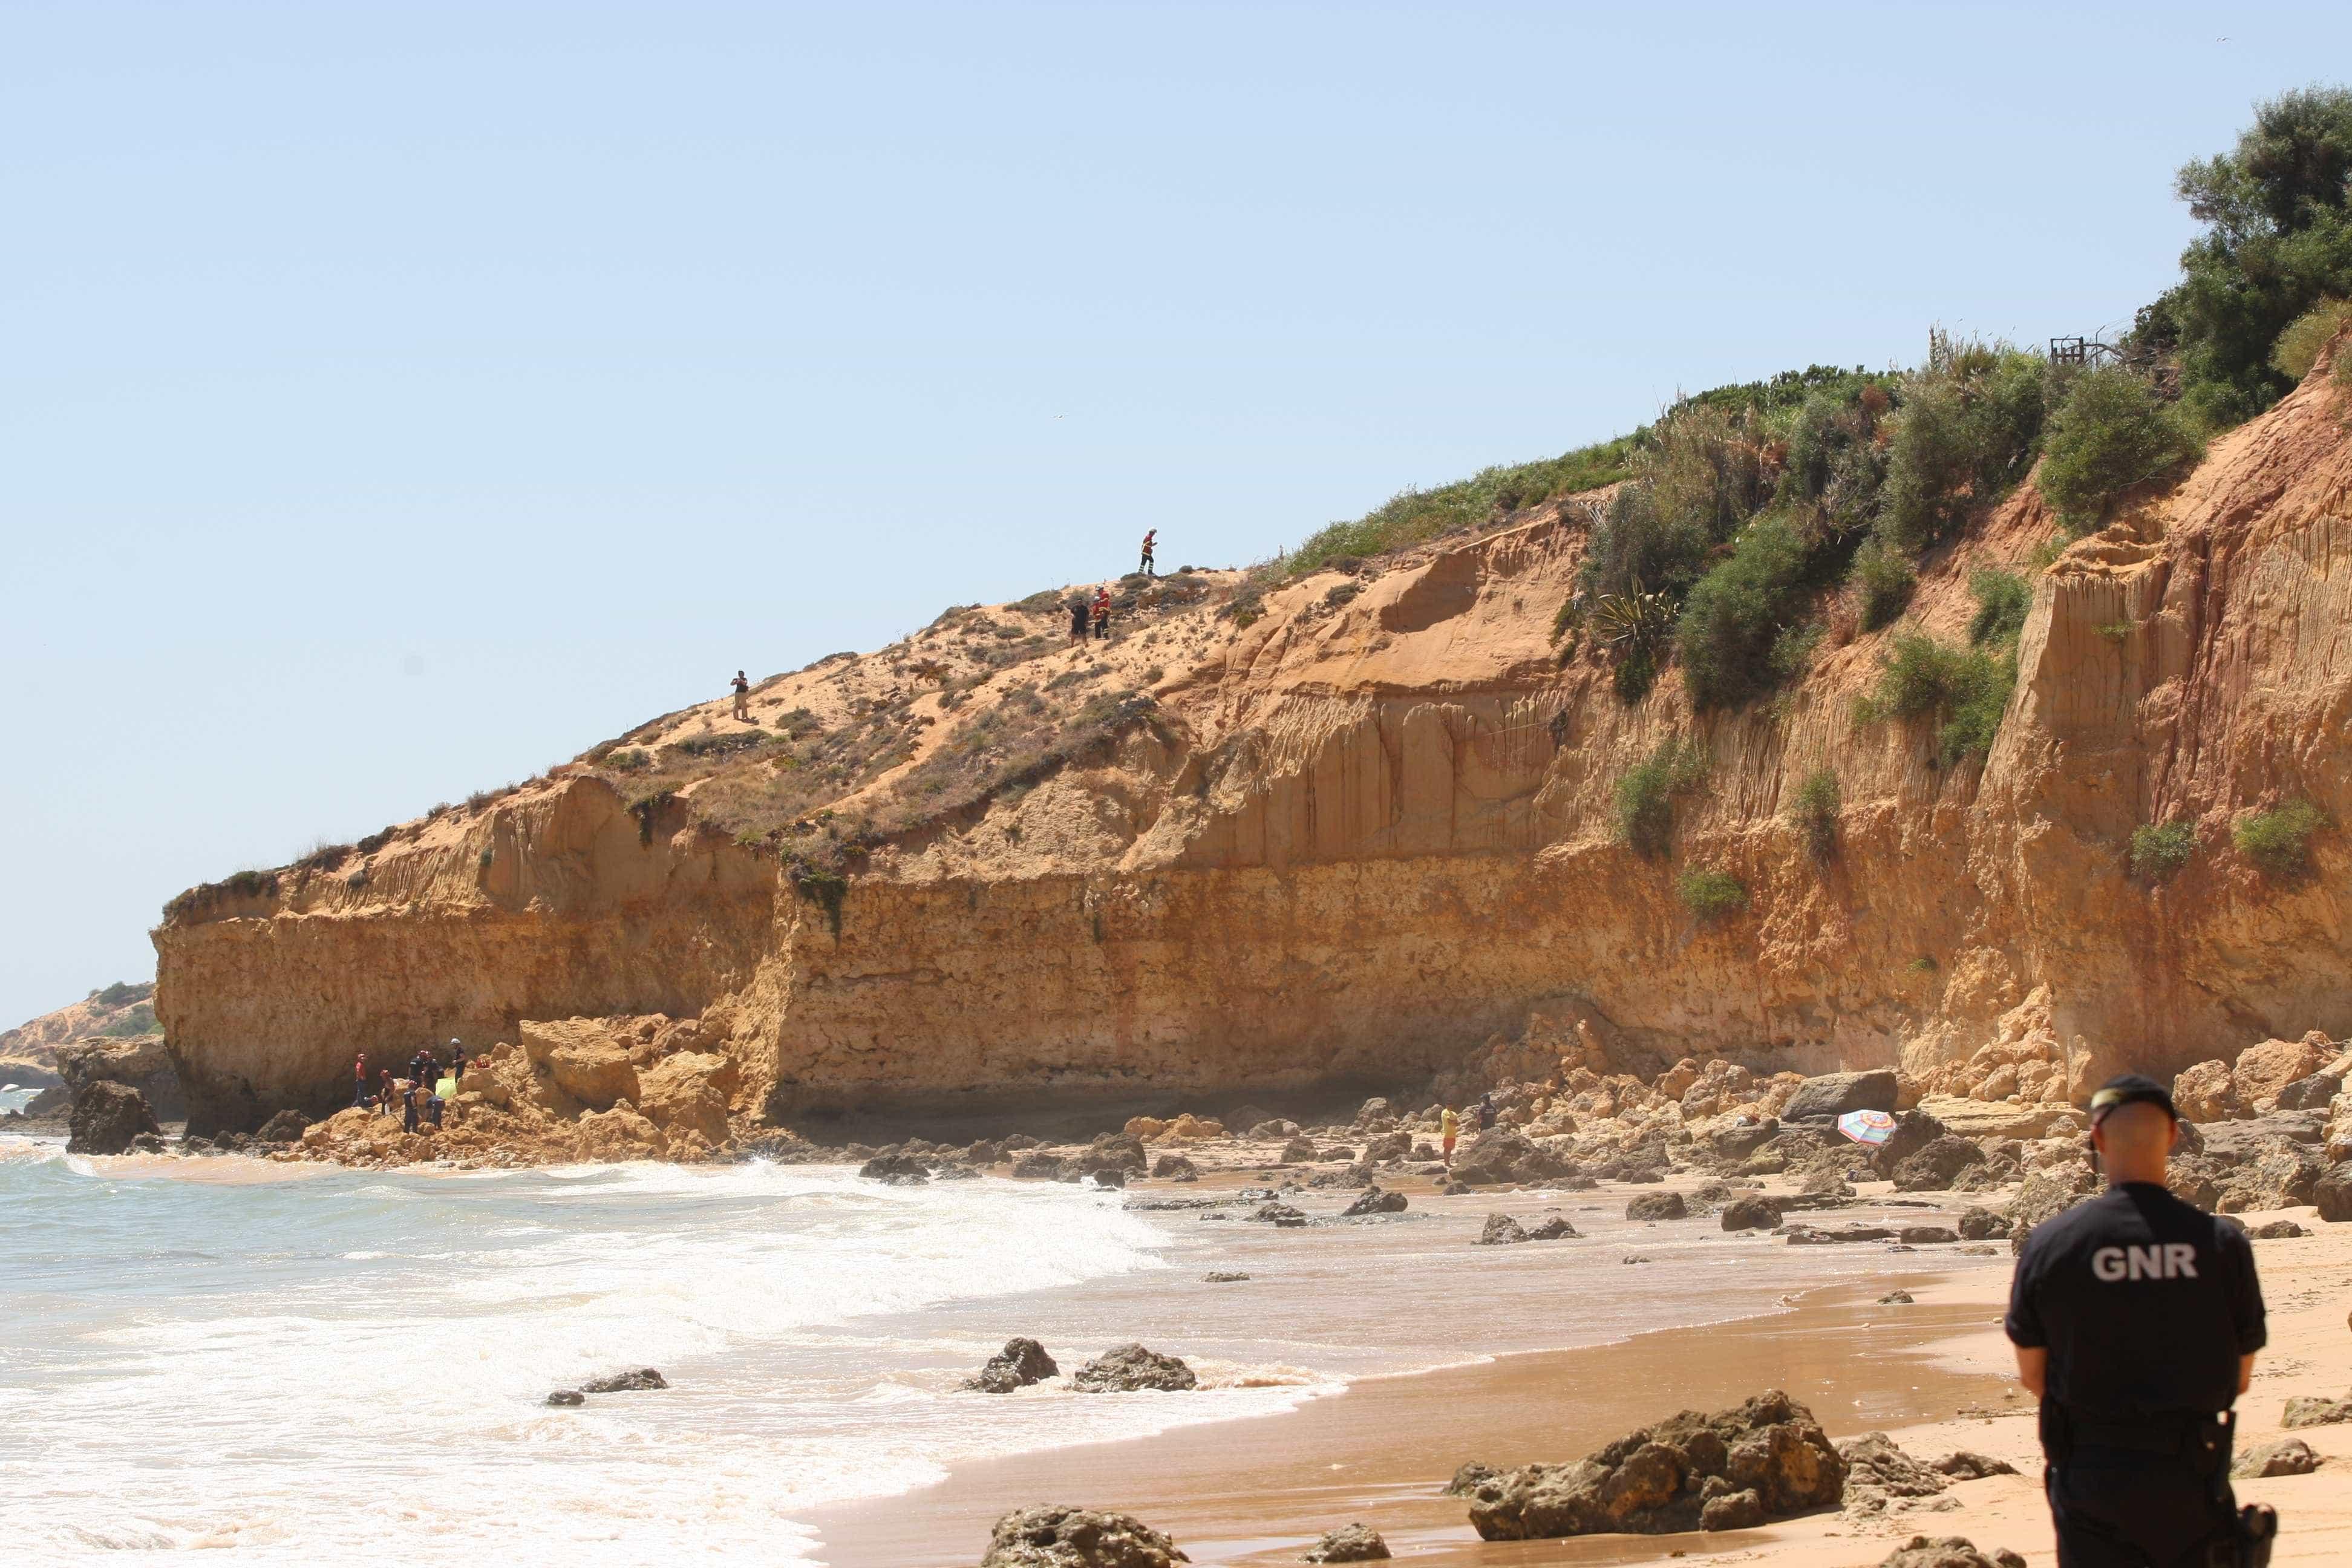 Derrocada na praia Maria Luísa sem vítimas ou danos materiais